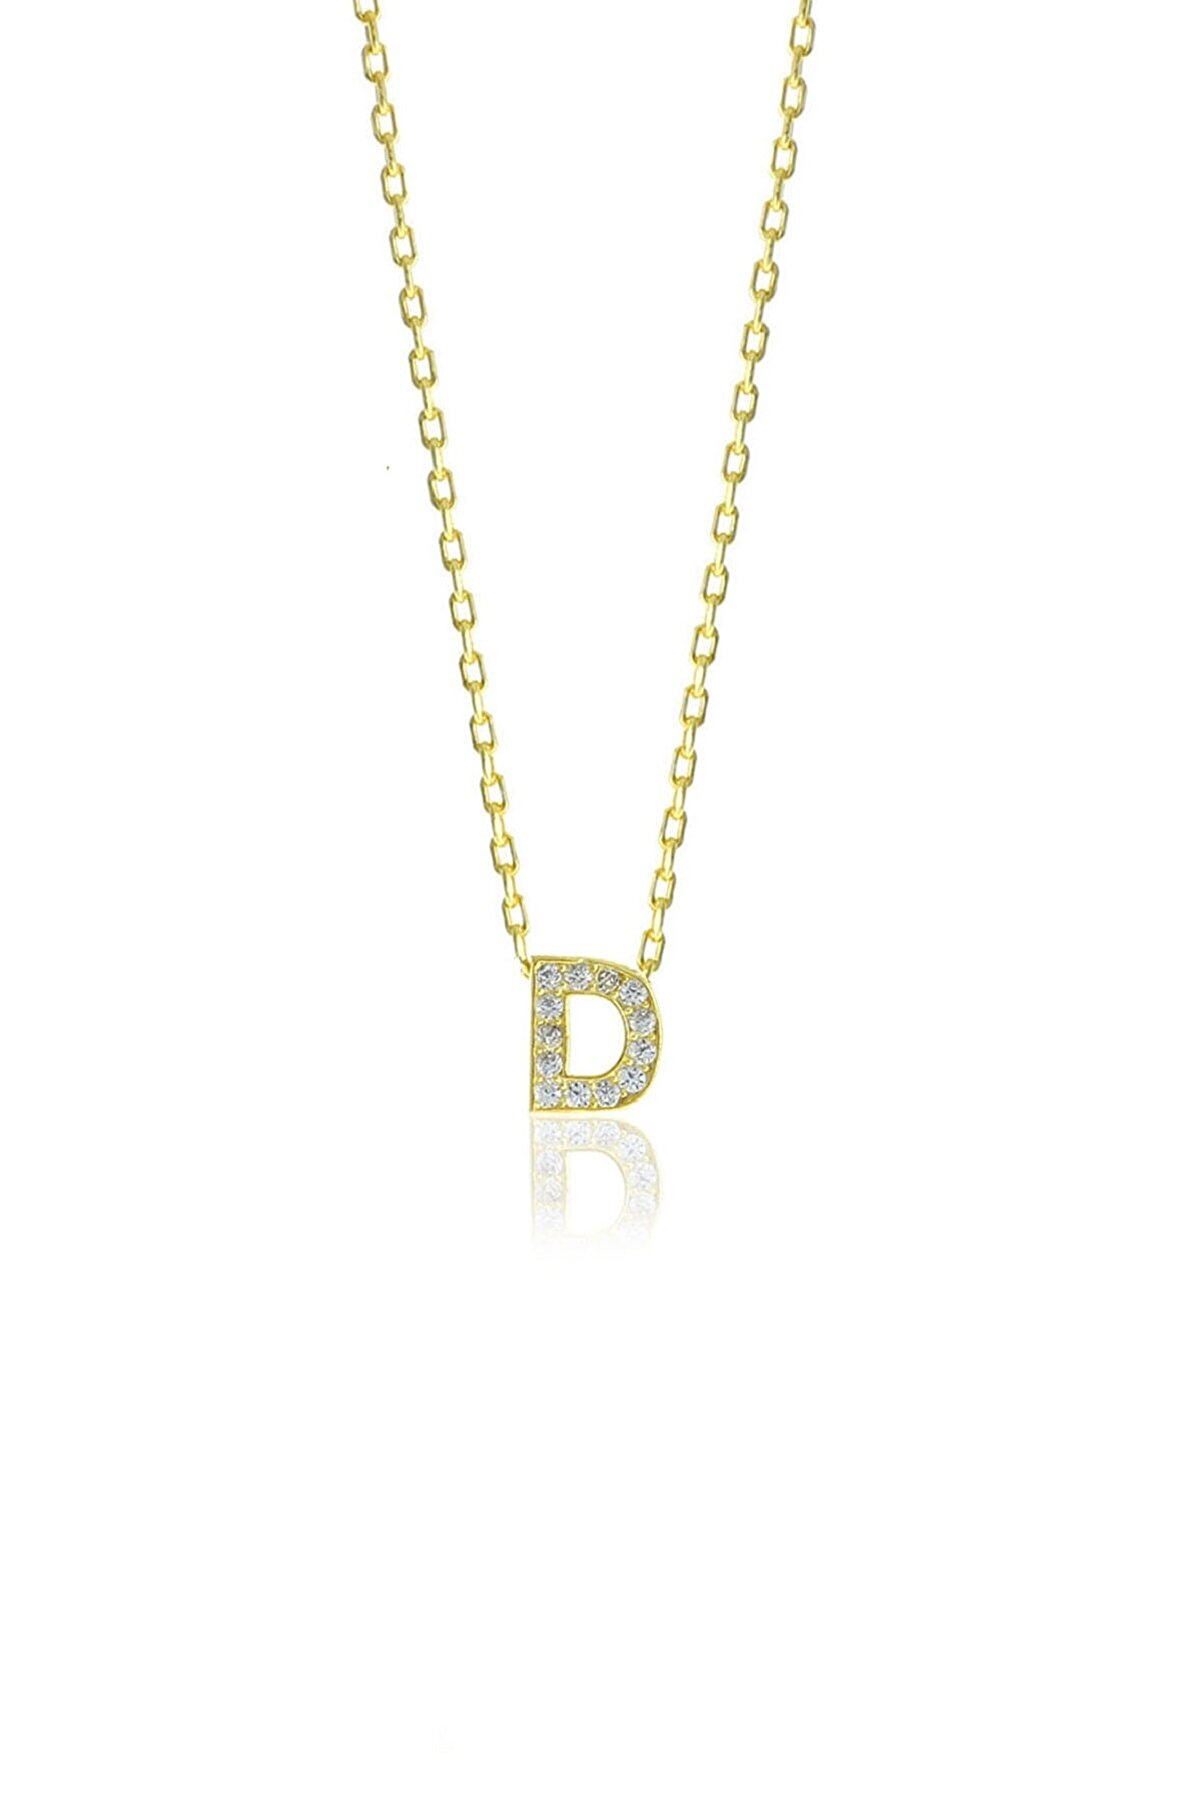 Söğütlü Silver Gümüş  Altın Yaldızlı Üç Boyutlu Minimal D Gümüş Harf Kolye